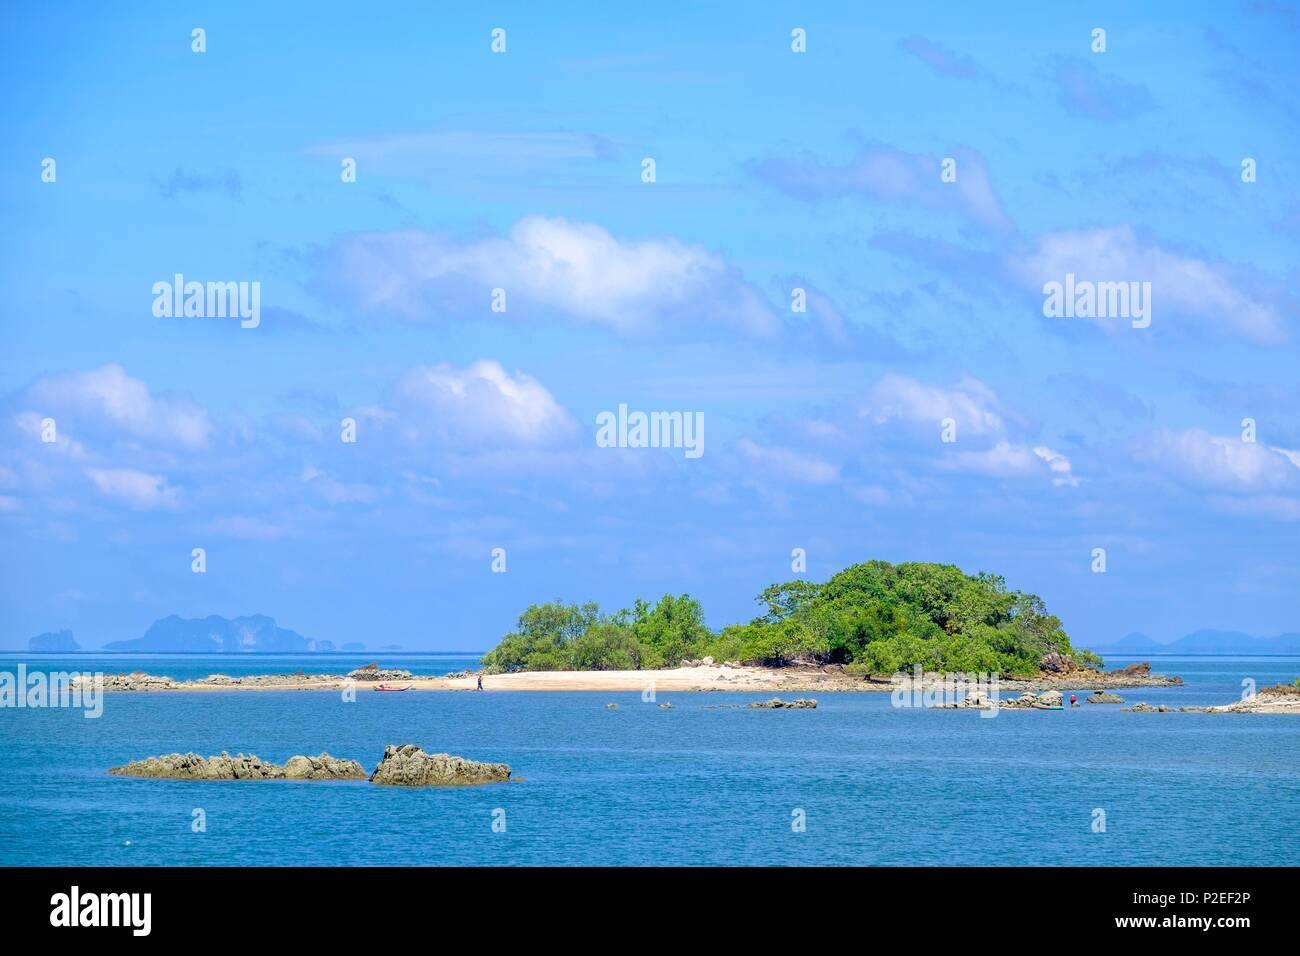 Thailand, Trang province, Ko Sukorn island, view from Ban Siammai main village - Stock Image